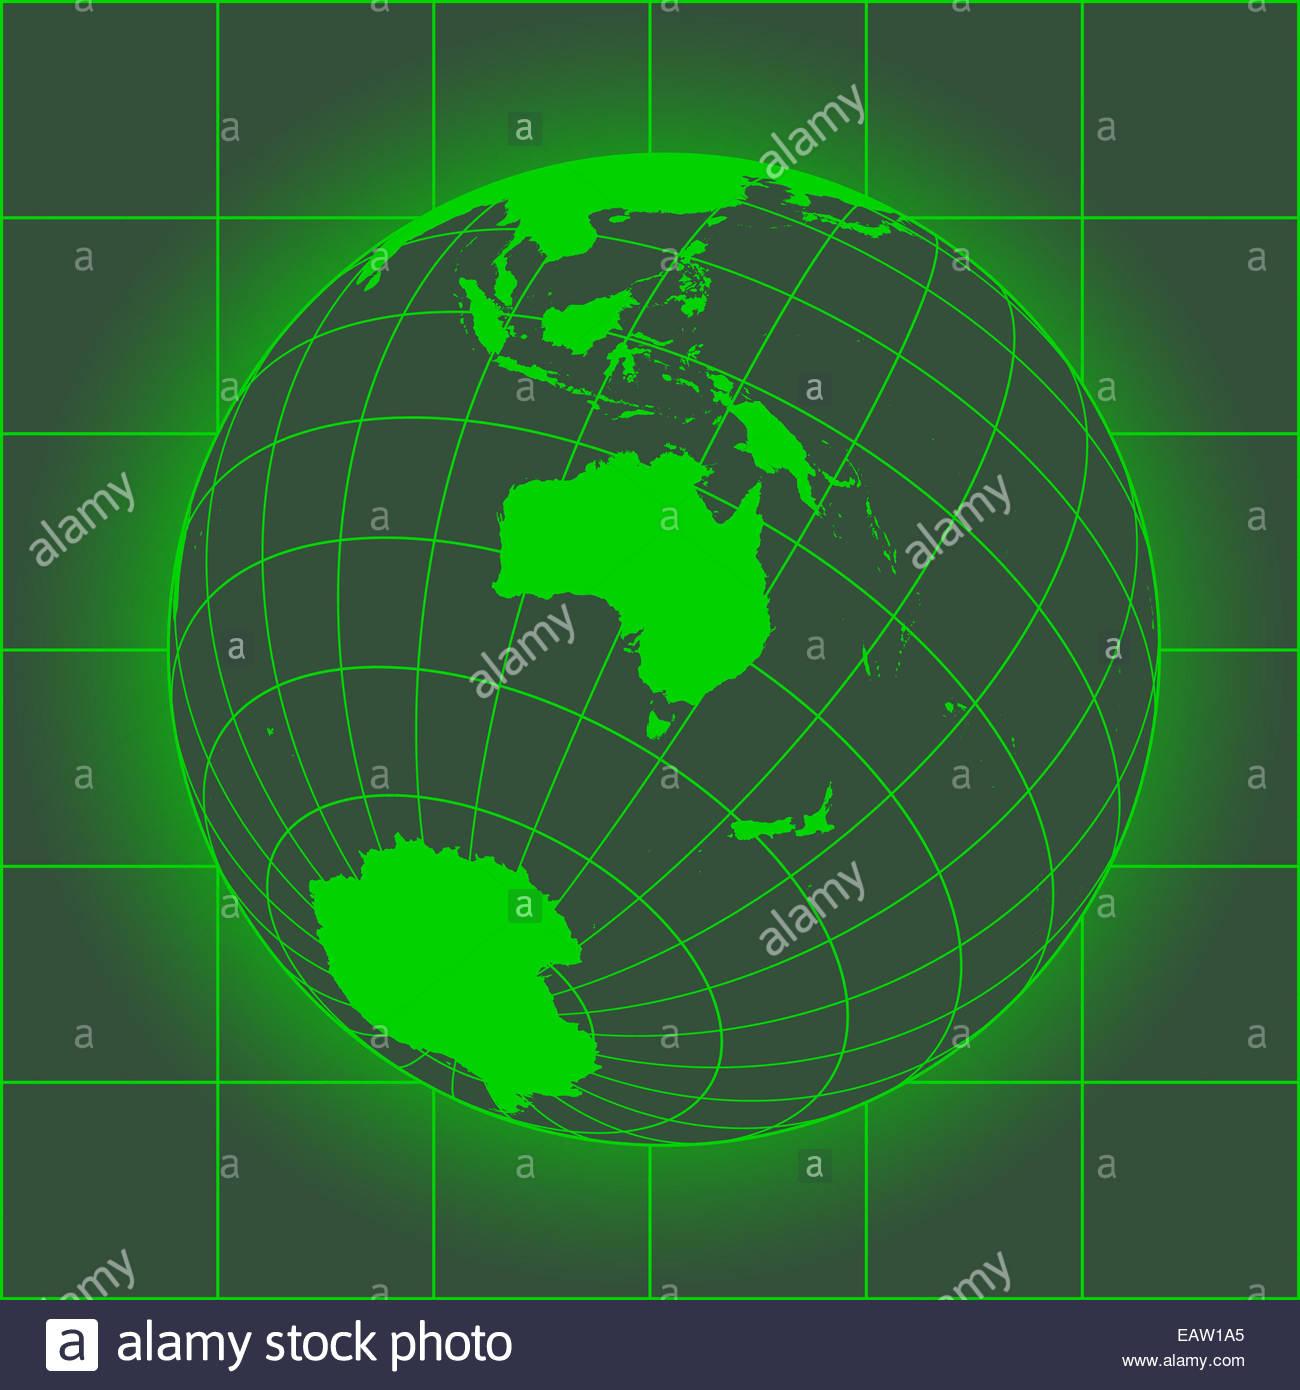 Green australia map asia russia antarctica north pole earth green australia map asia russia antarctica north pole earth globe old style map of the world gumiabroncs Images